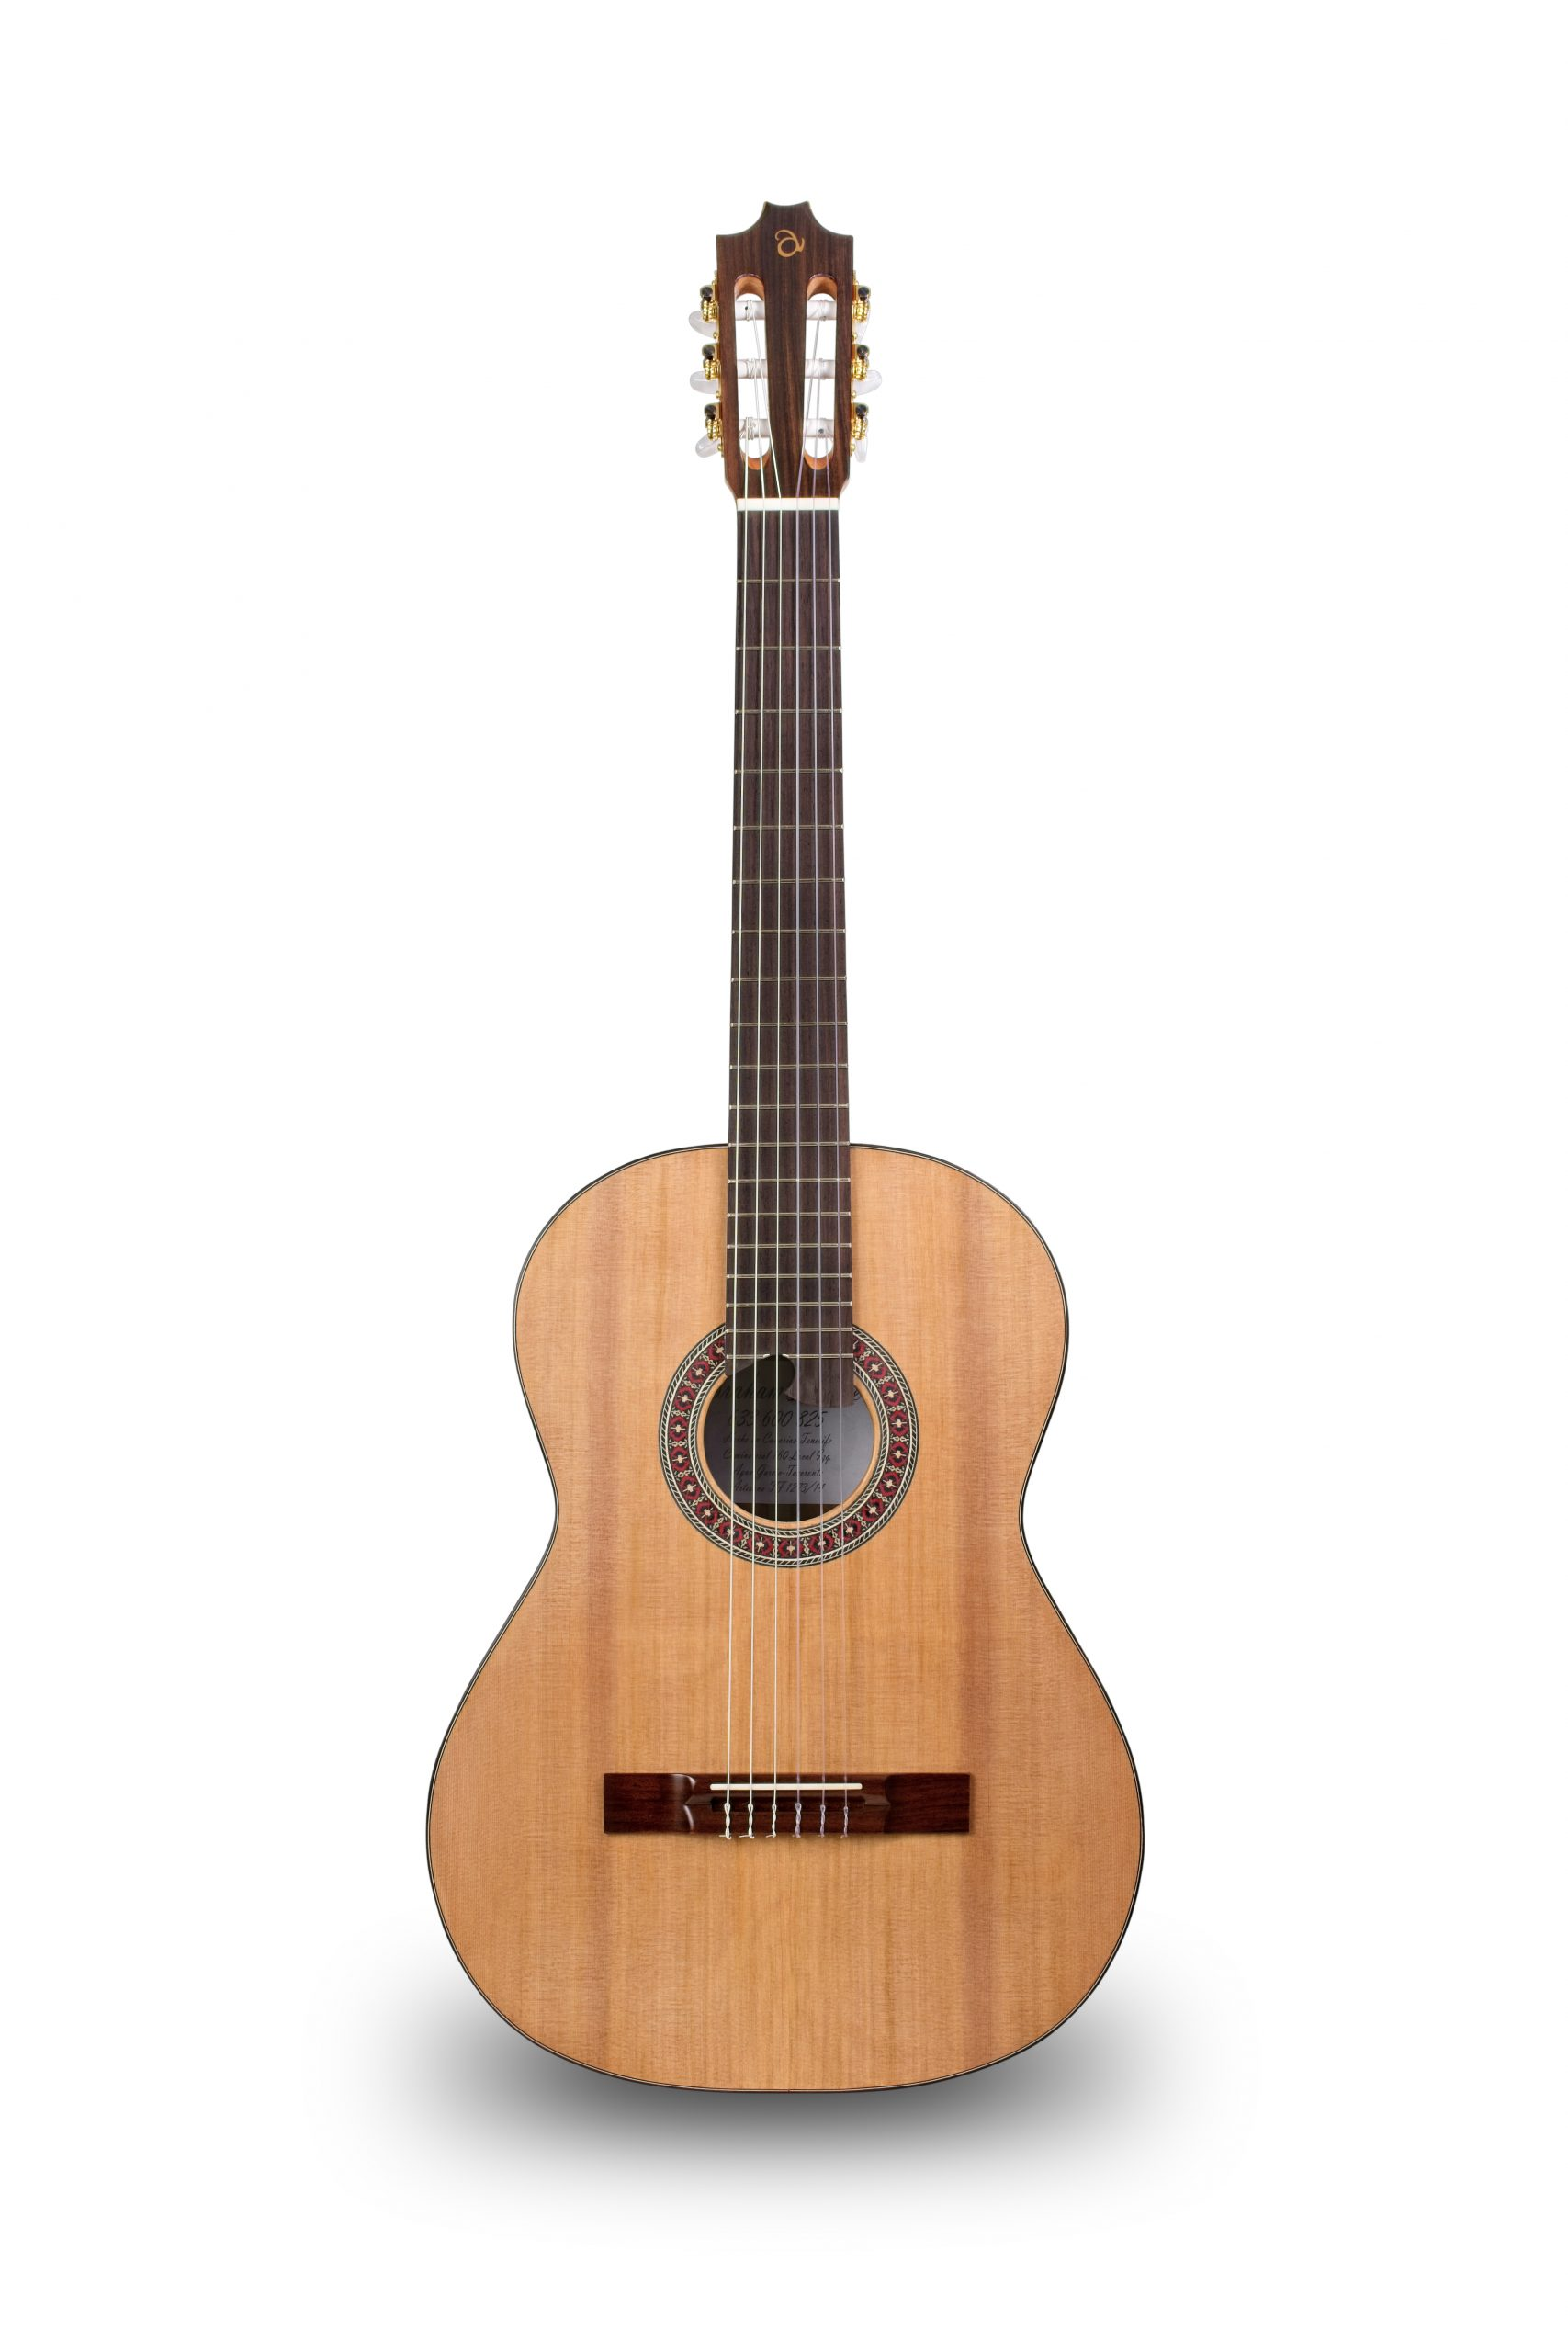 Guitarra Artesanal modelo Las Breñas. Abraham Luthier